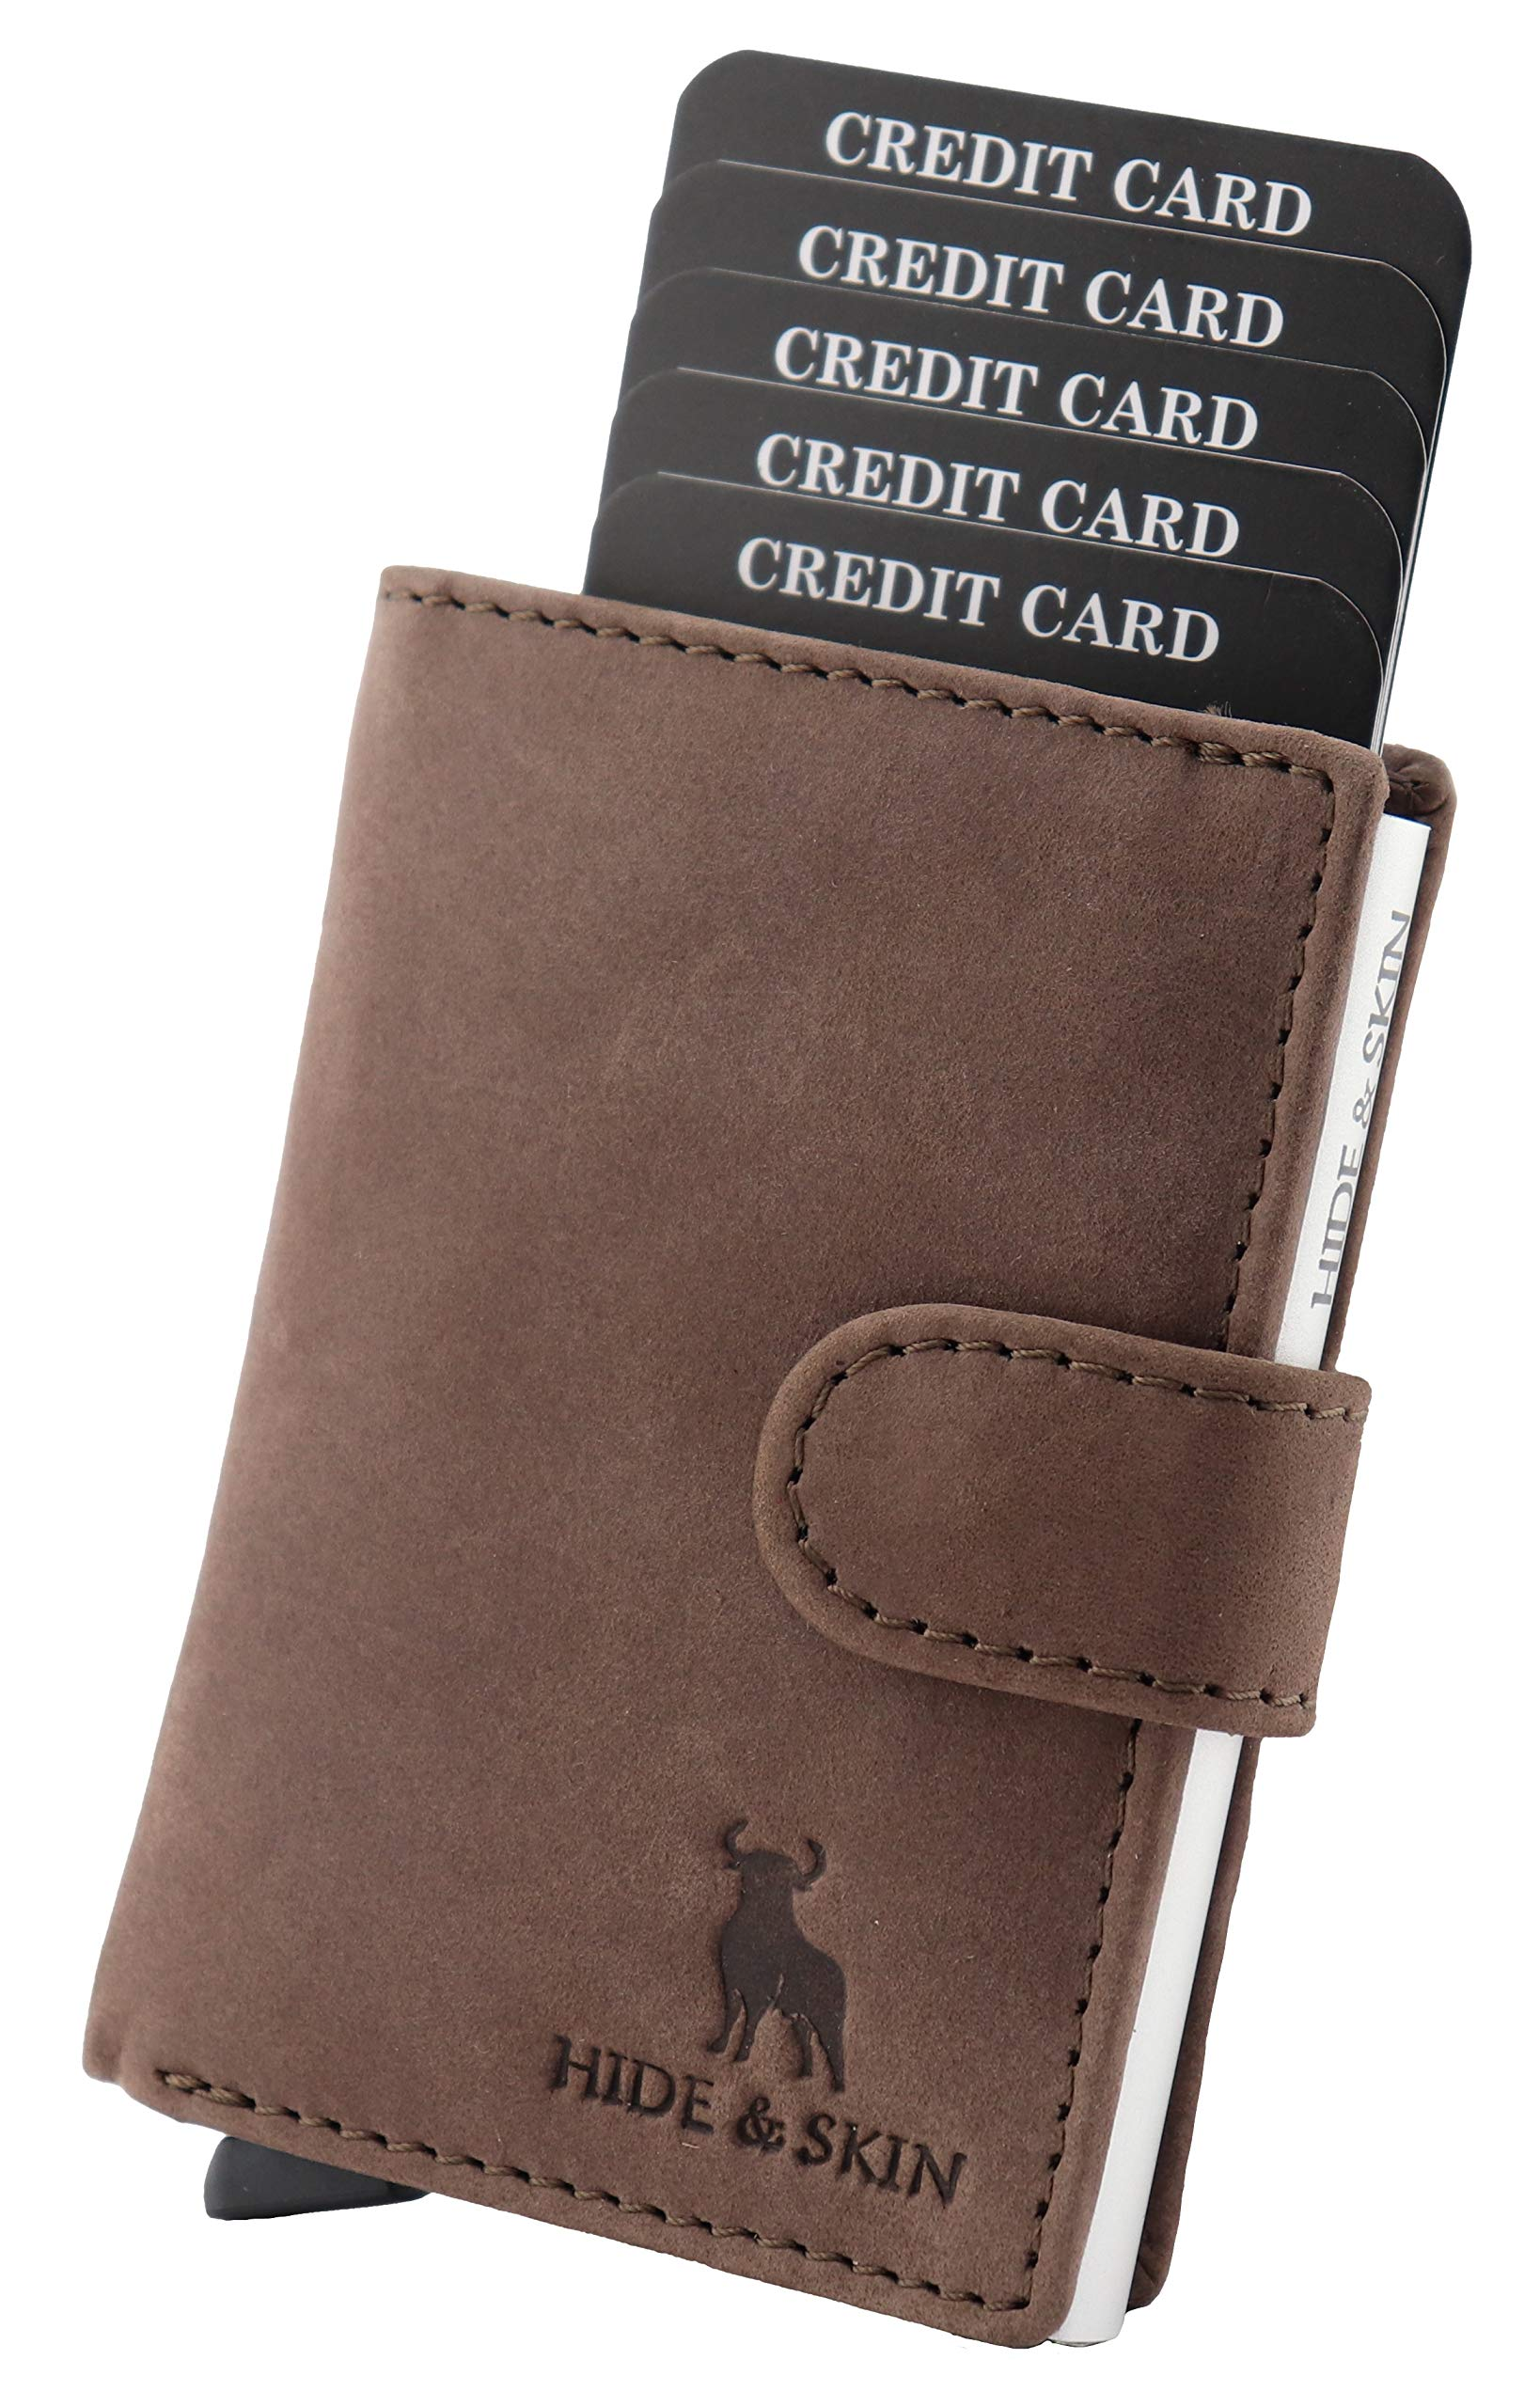 HIDE & SKIN Unisex Leather RFID Blocking Card Holder (Brown) product image